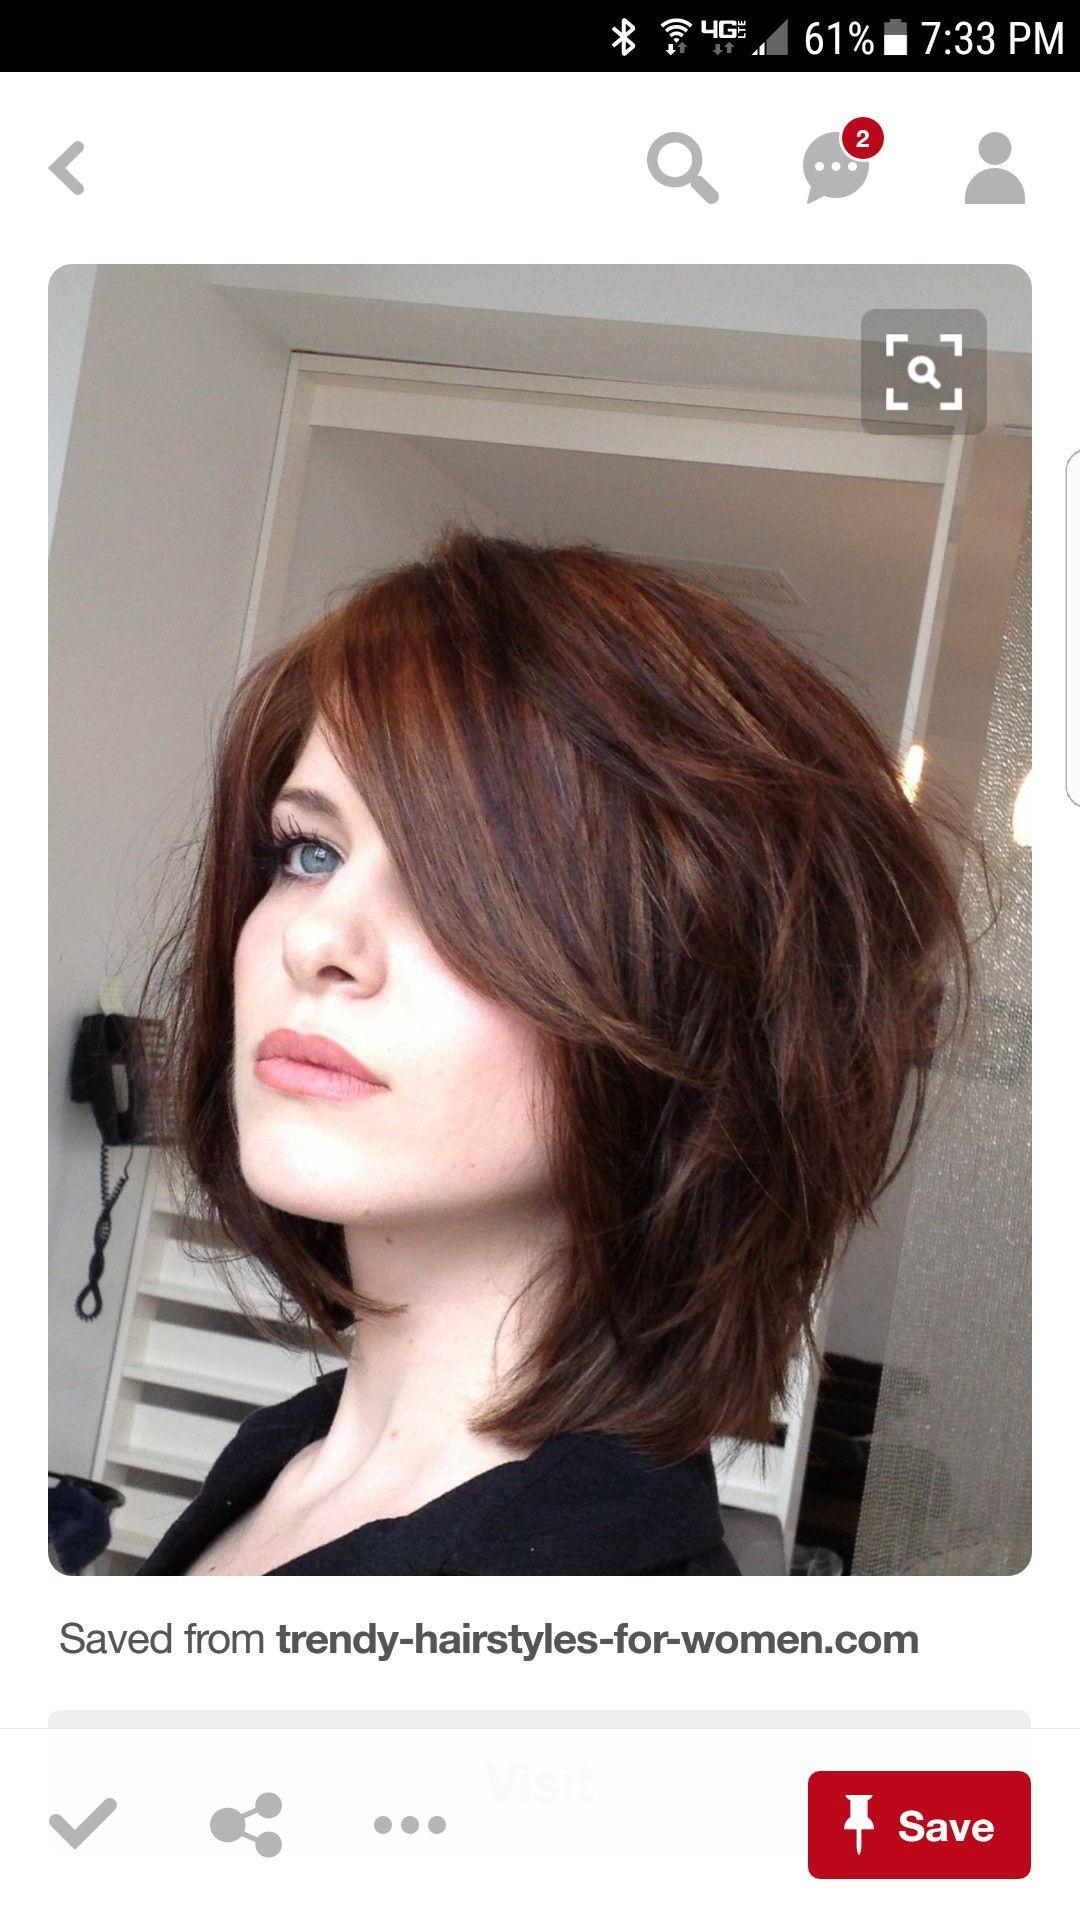 Pin by marianna arpino on hair inspo pinterest hair styles hair